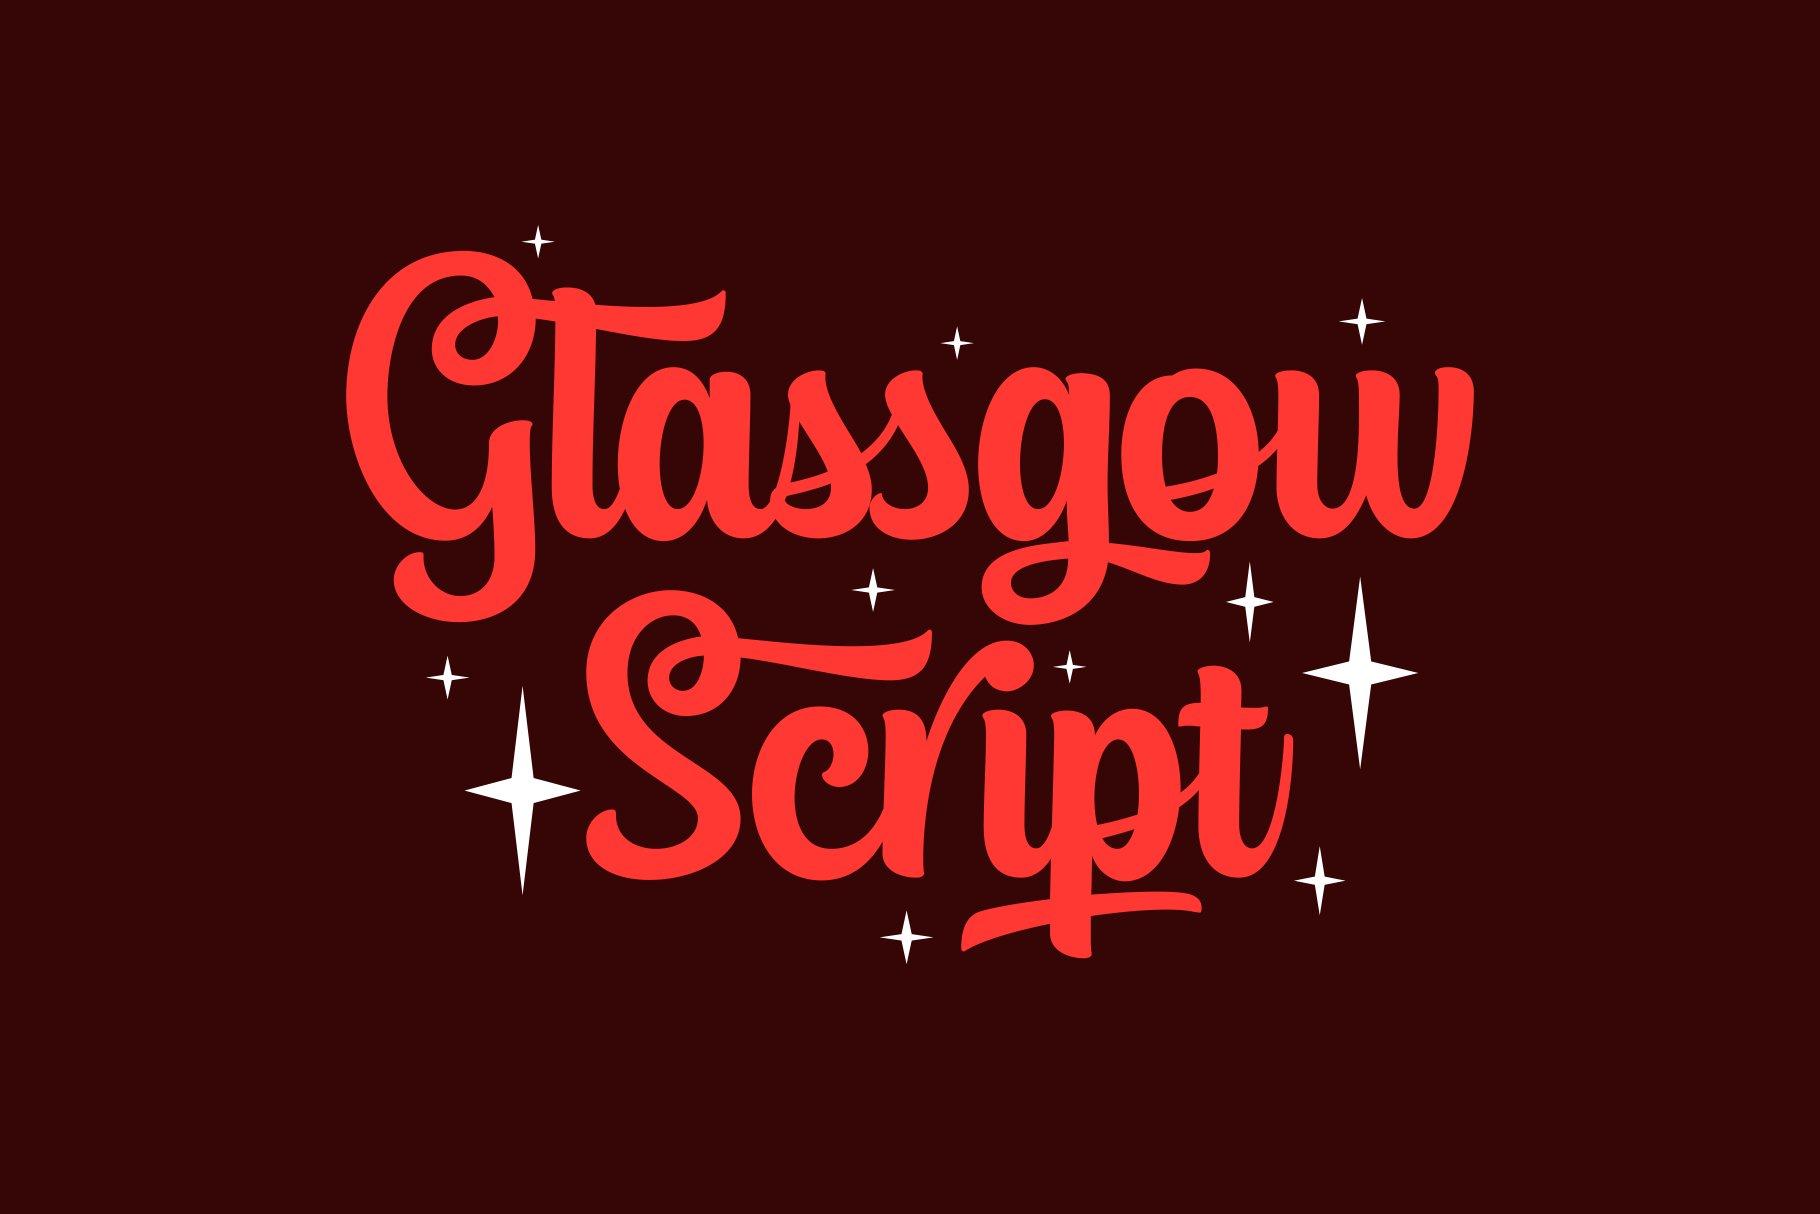 Glassgow Script example image 1